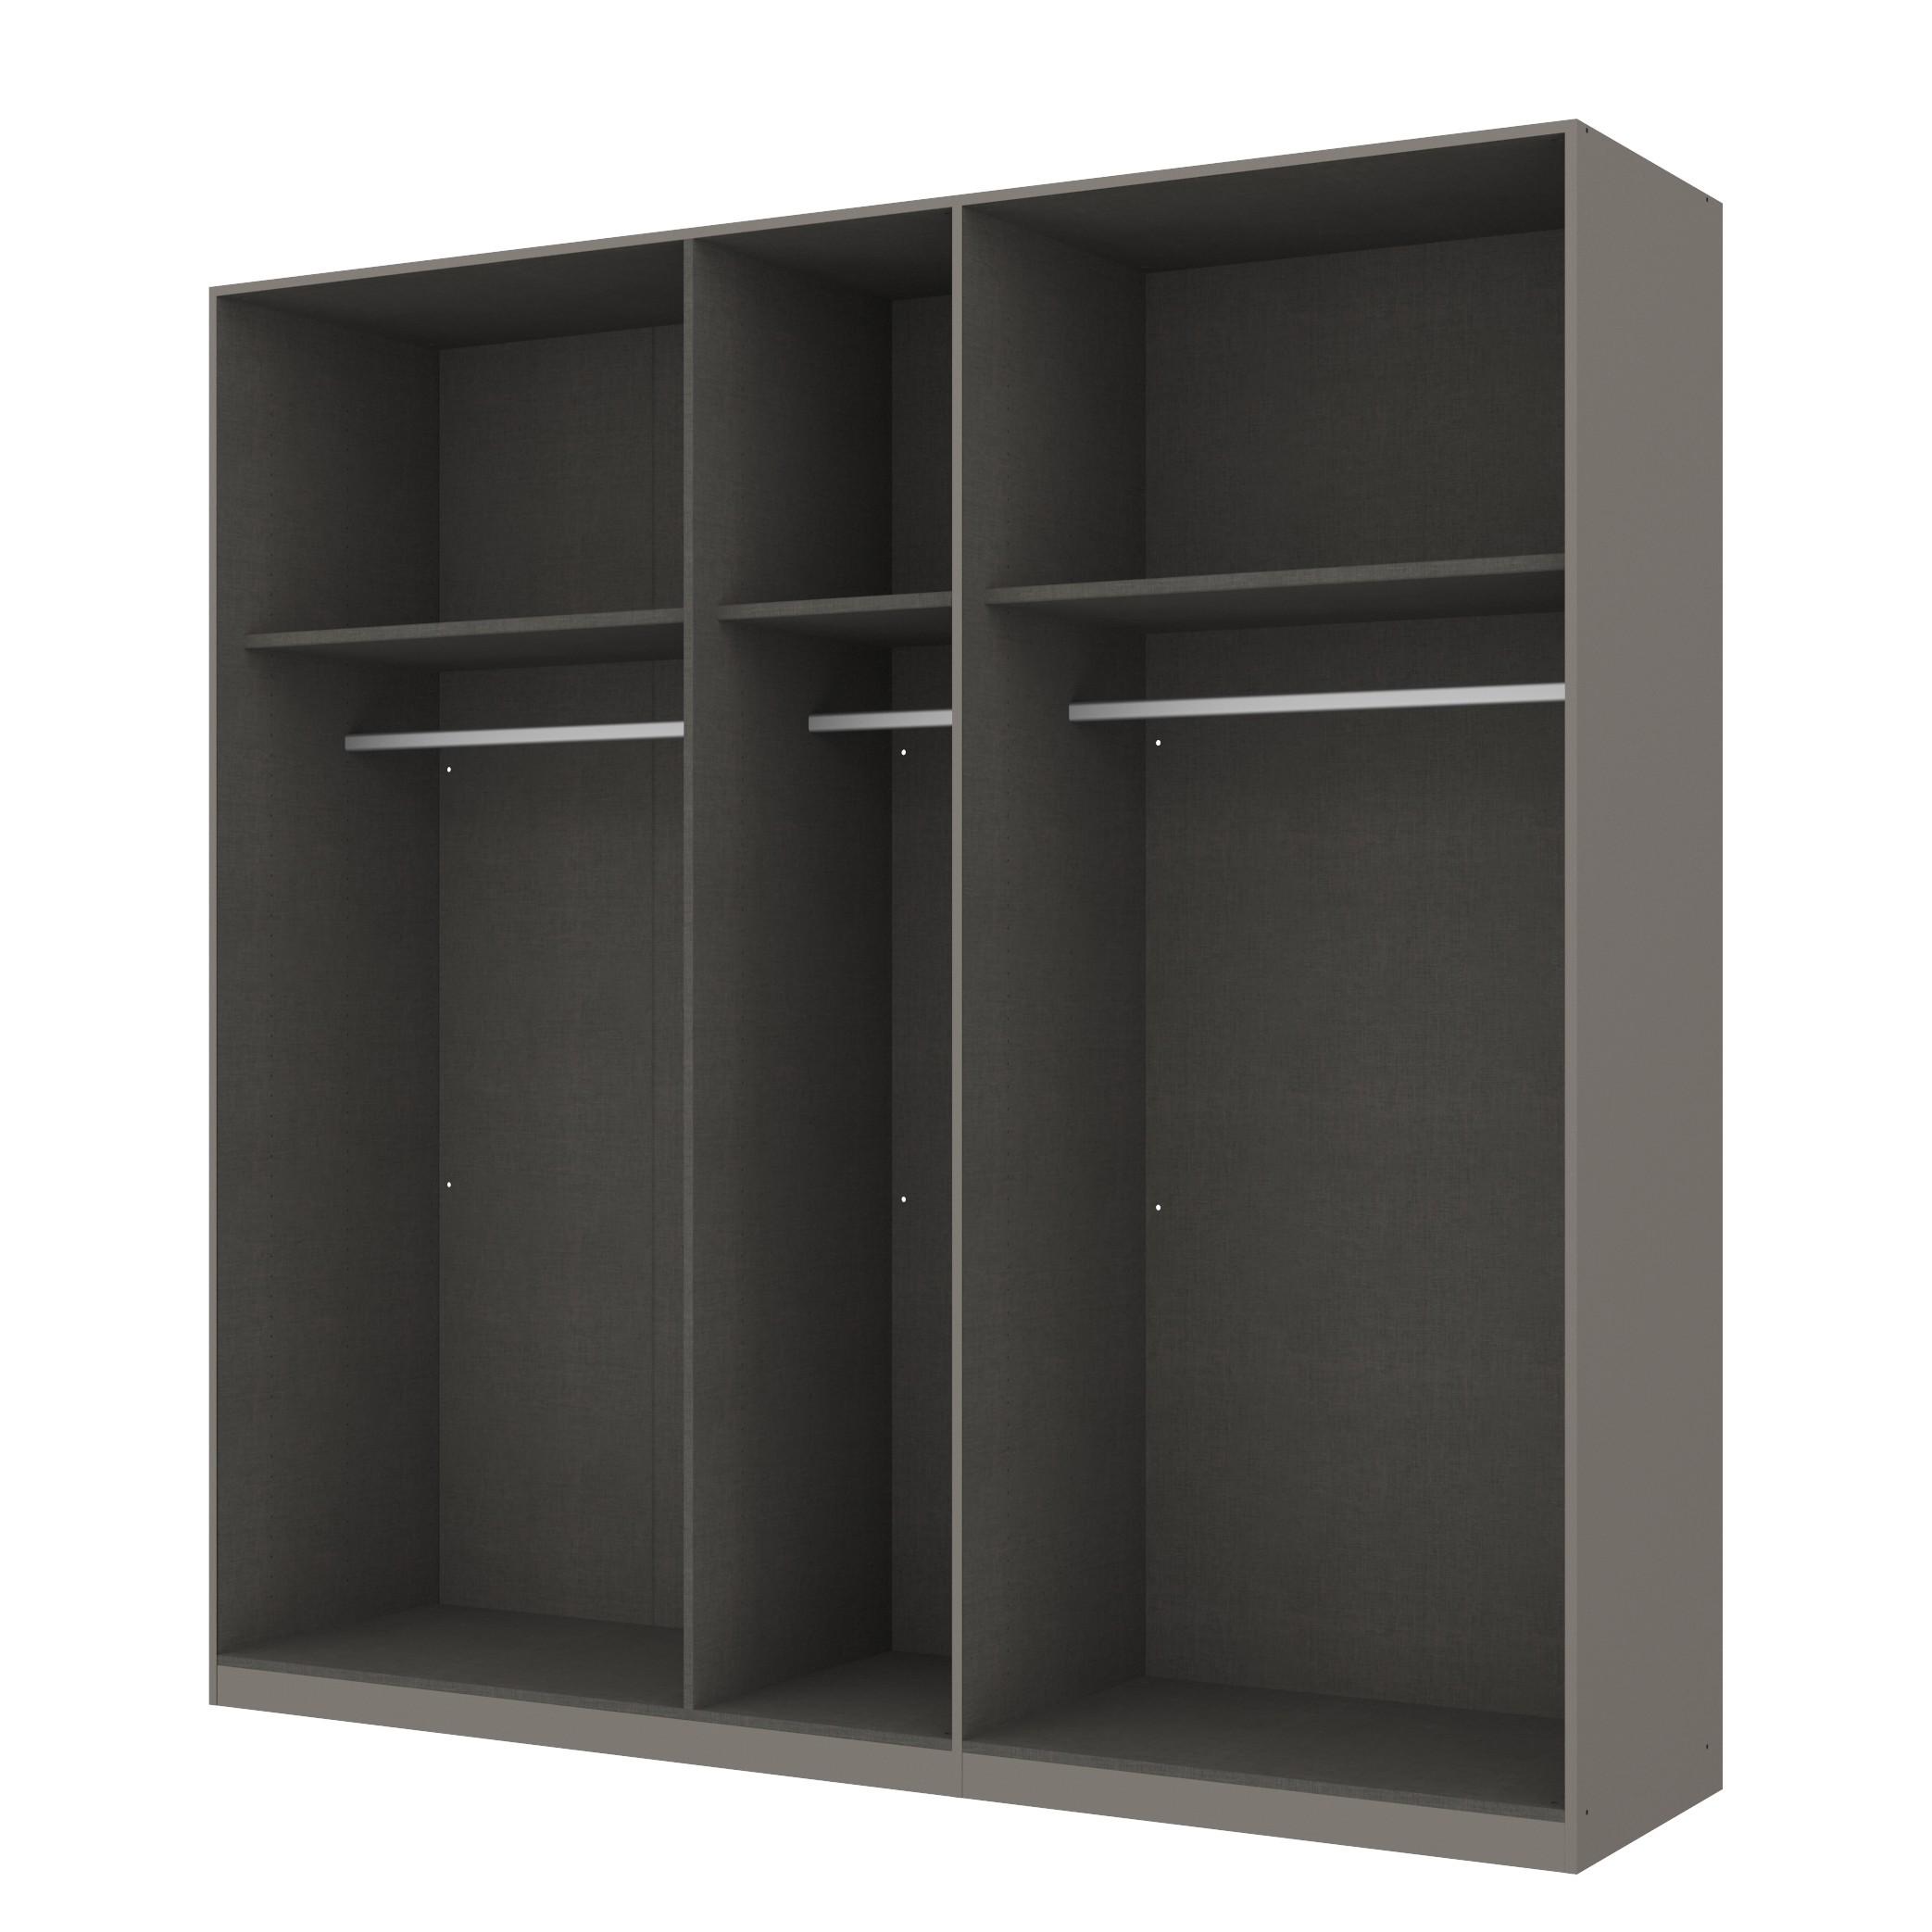 Armoire sans porte Skøp - Graphite - 225 cm (5 portes) - 222 cm - Basic, SKØP